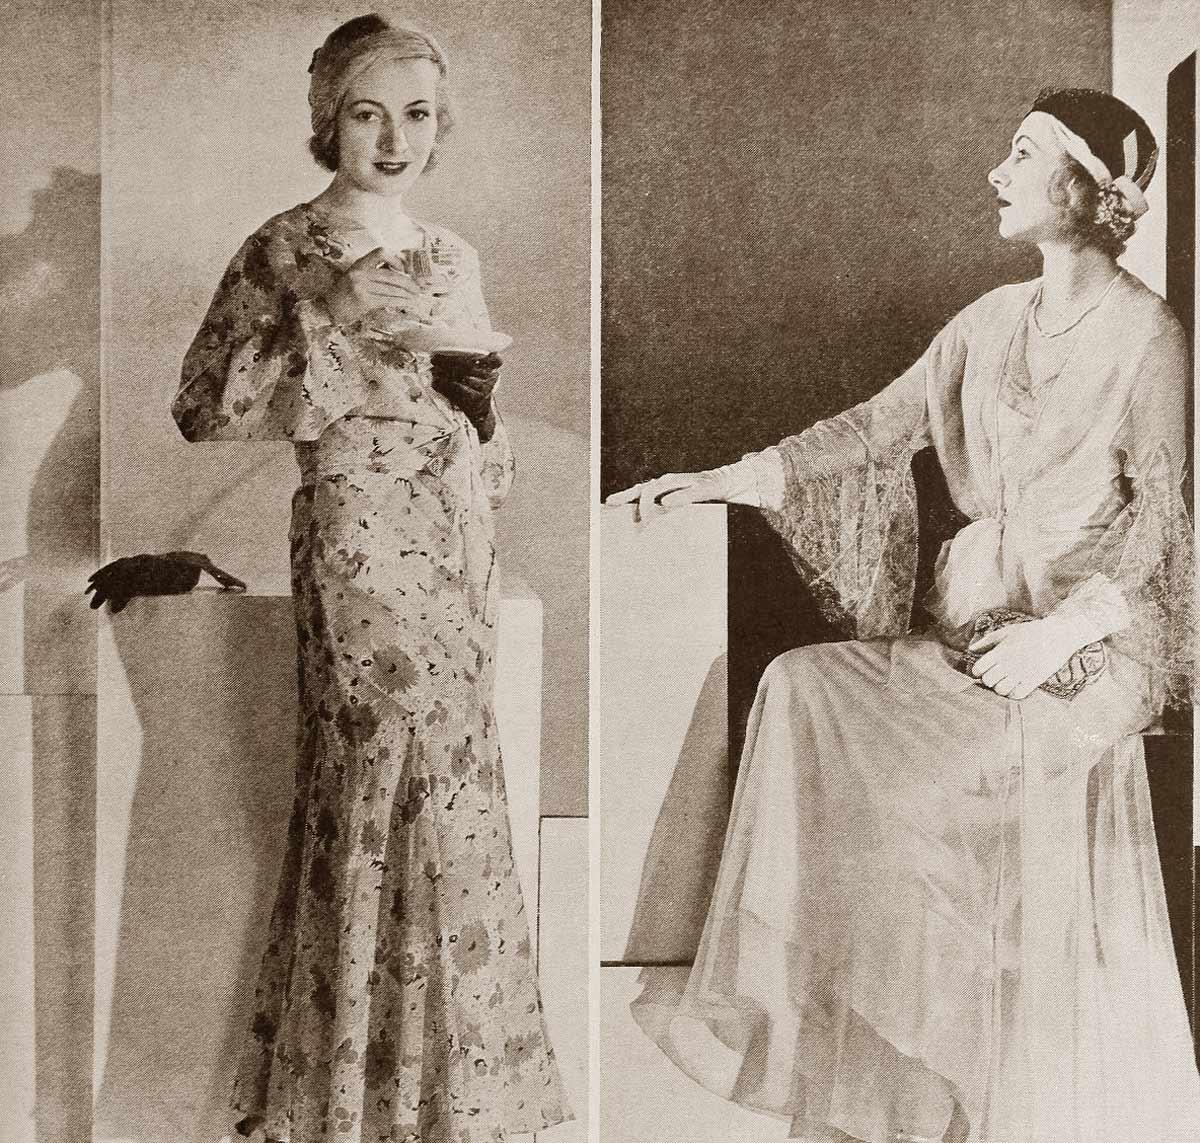 Karen-Morley---1932-fashions